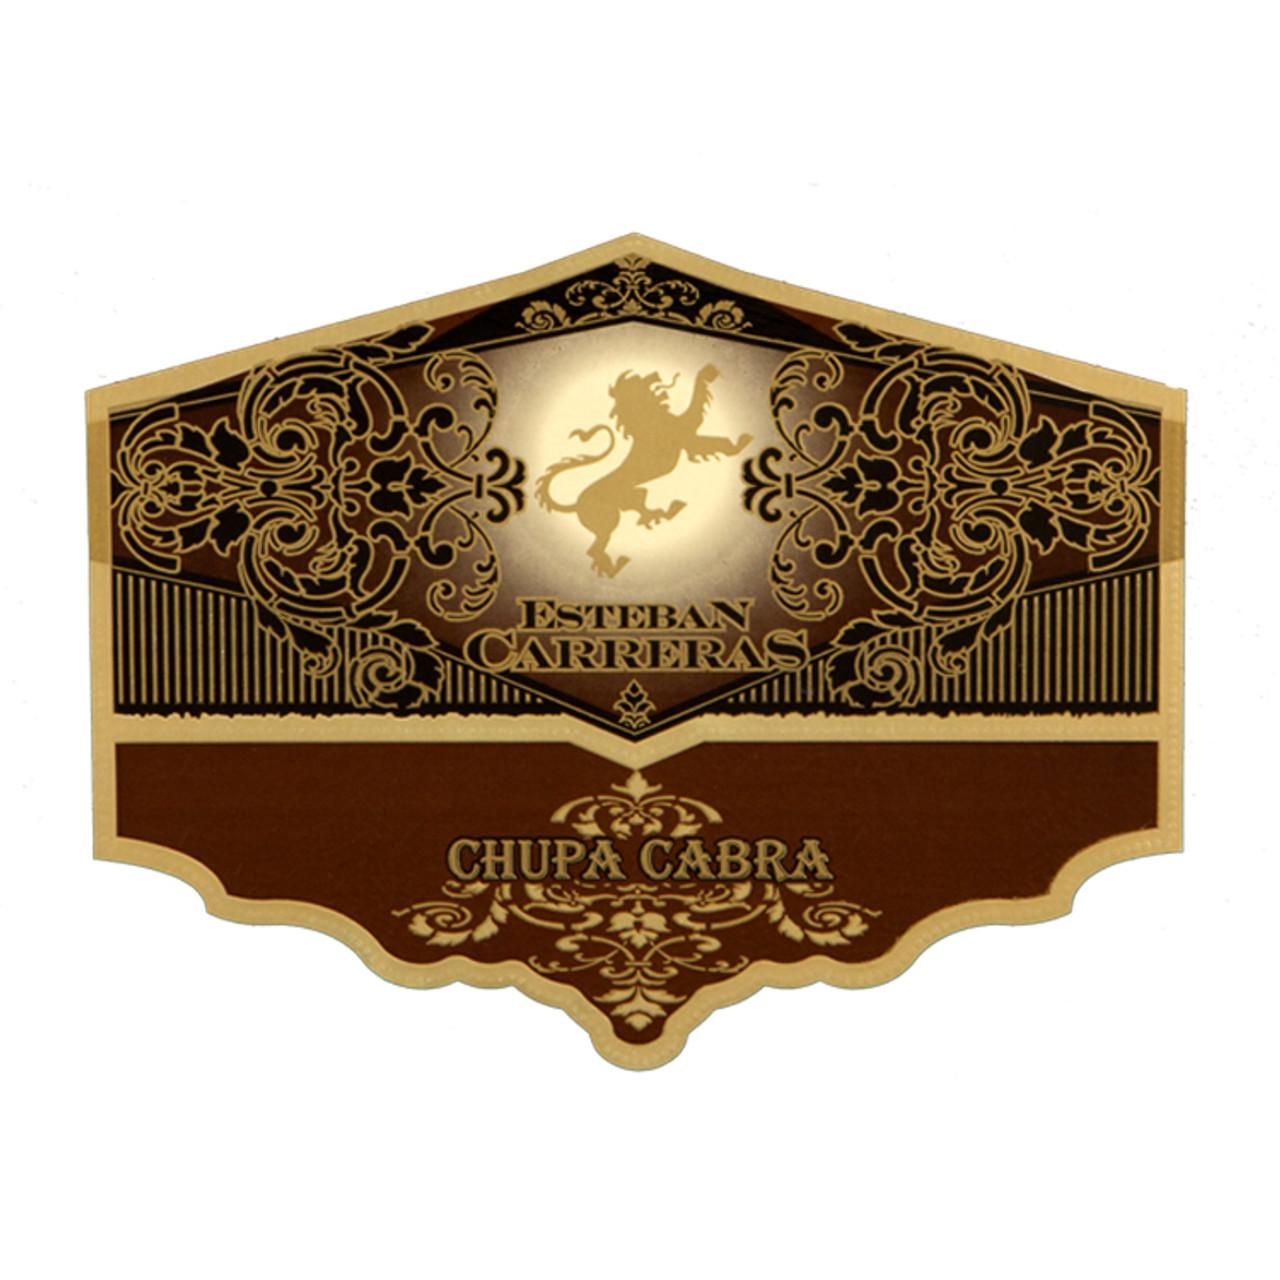 Esteban Carreras Chupacabra Sixty Cigars - 6 x 60 (Box of 20)